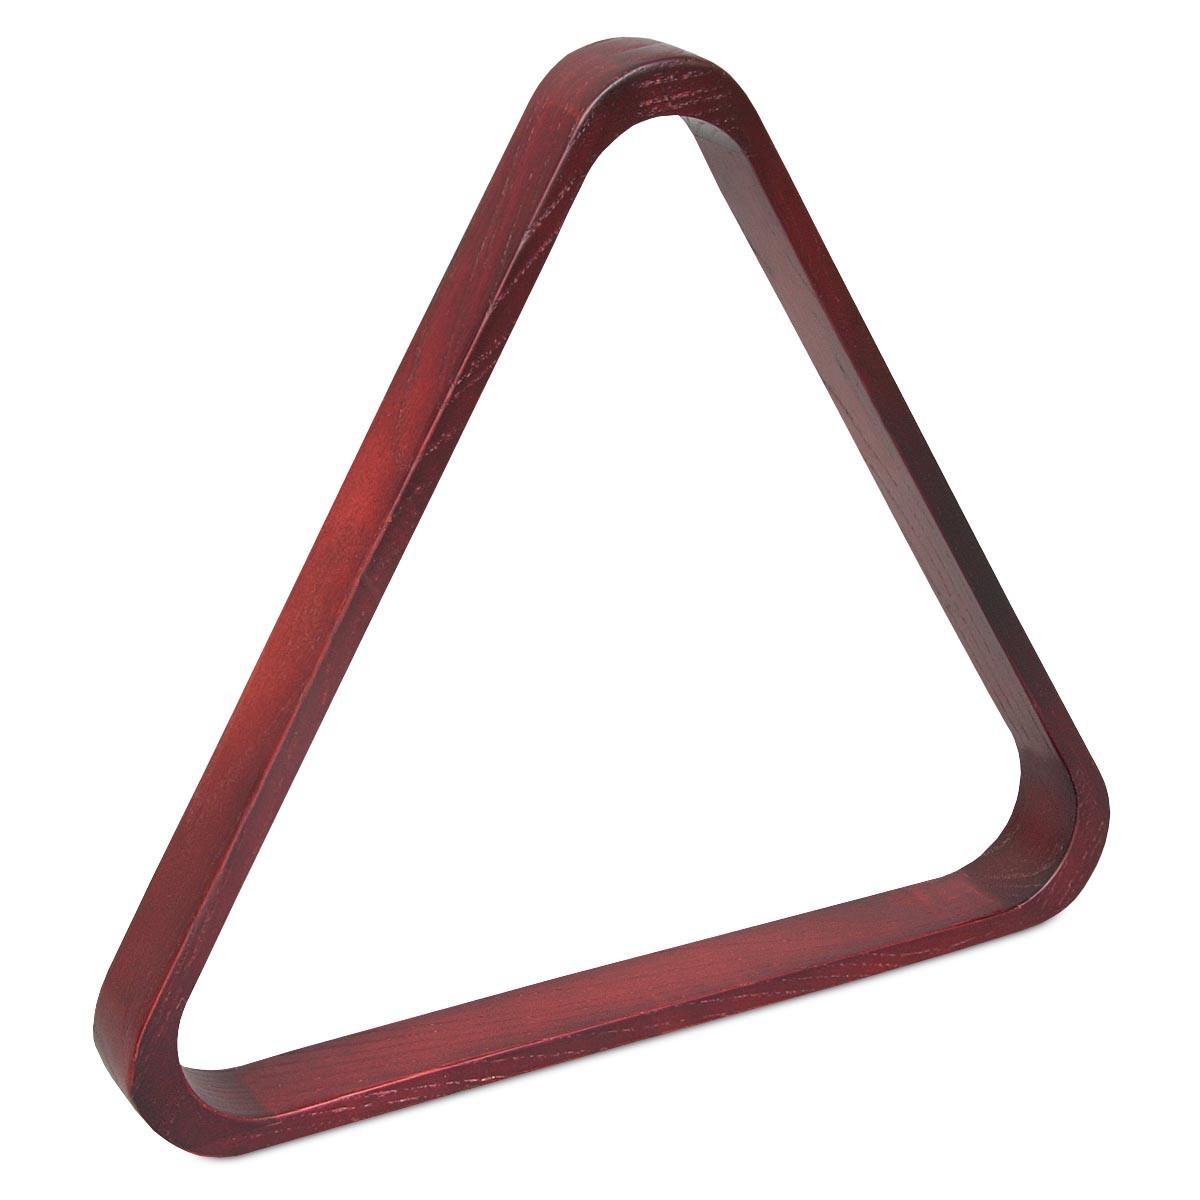 Треугольник для русского бильярда Classic дуб махагон ø68мм